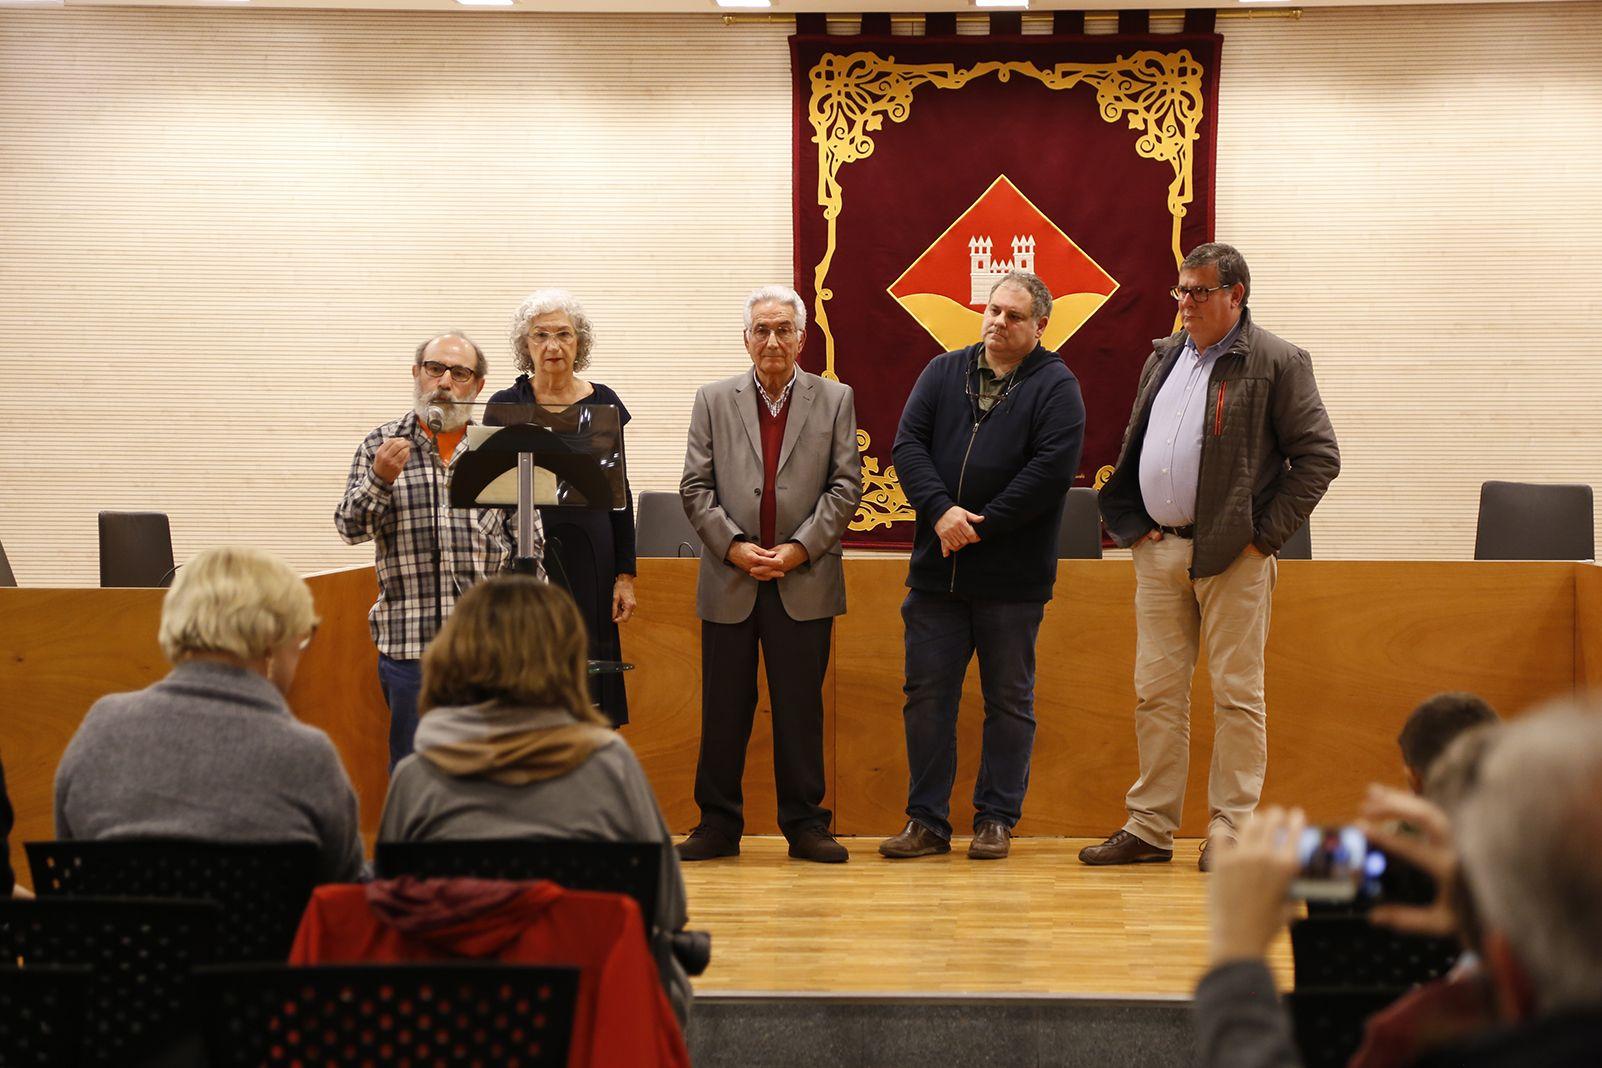 Premis literari de l'EMD. FOTO: Anna Bassa